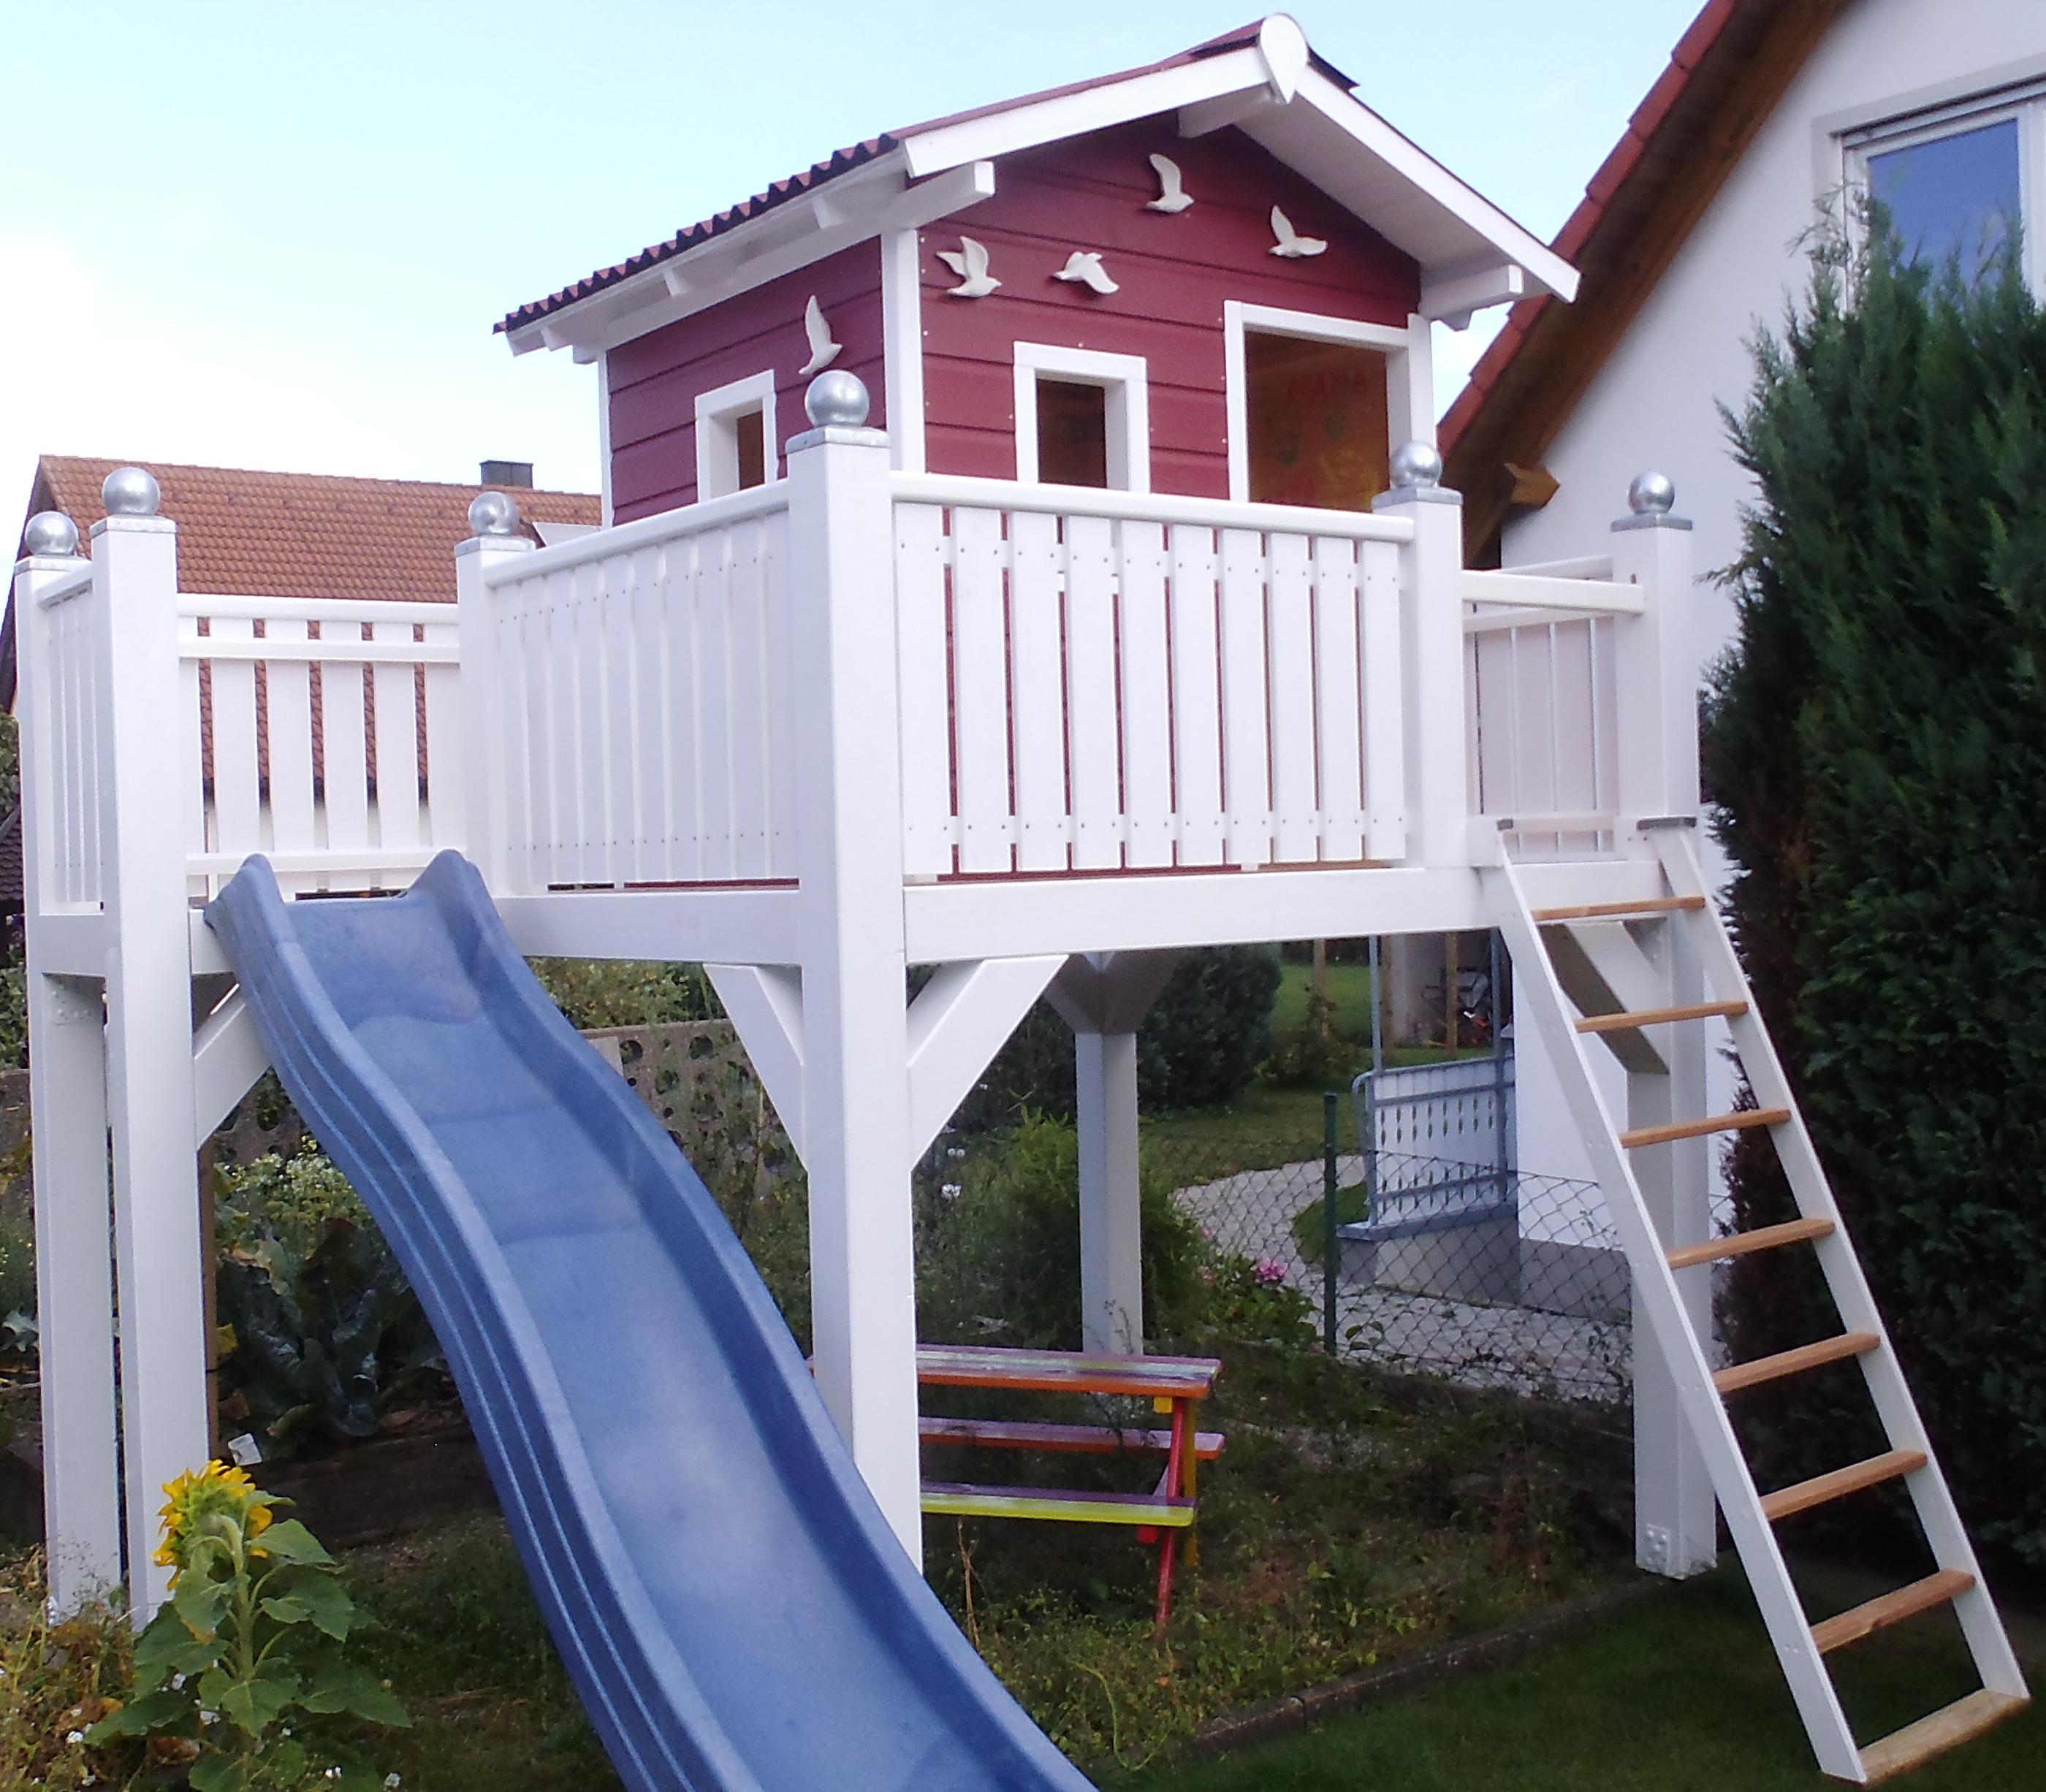 Lillys Traumhaus